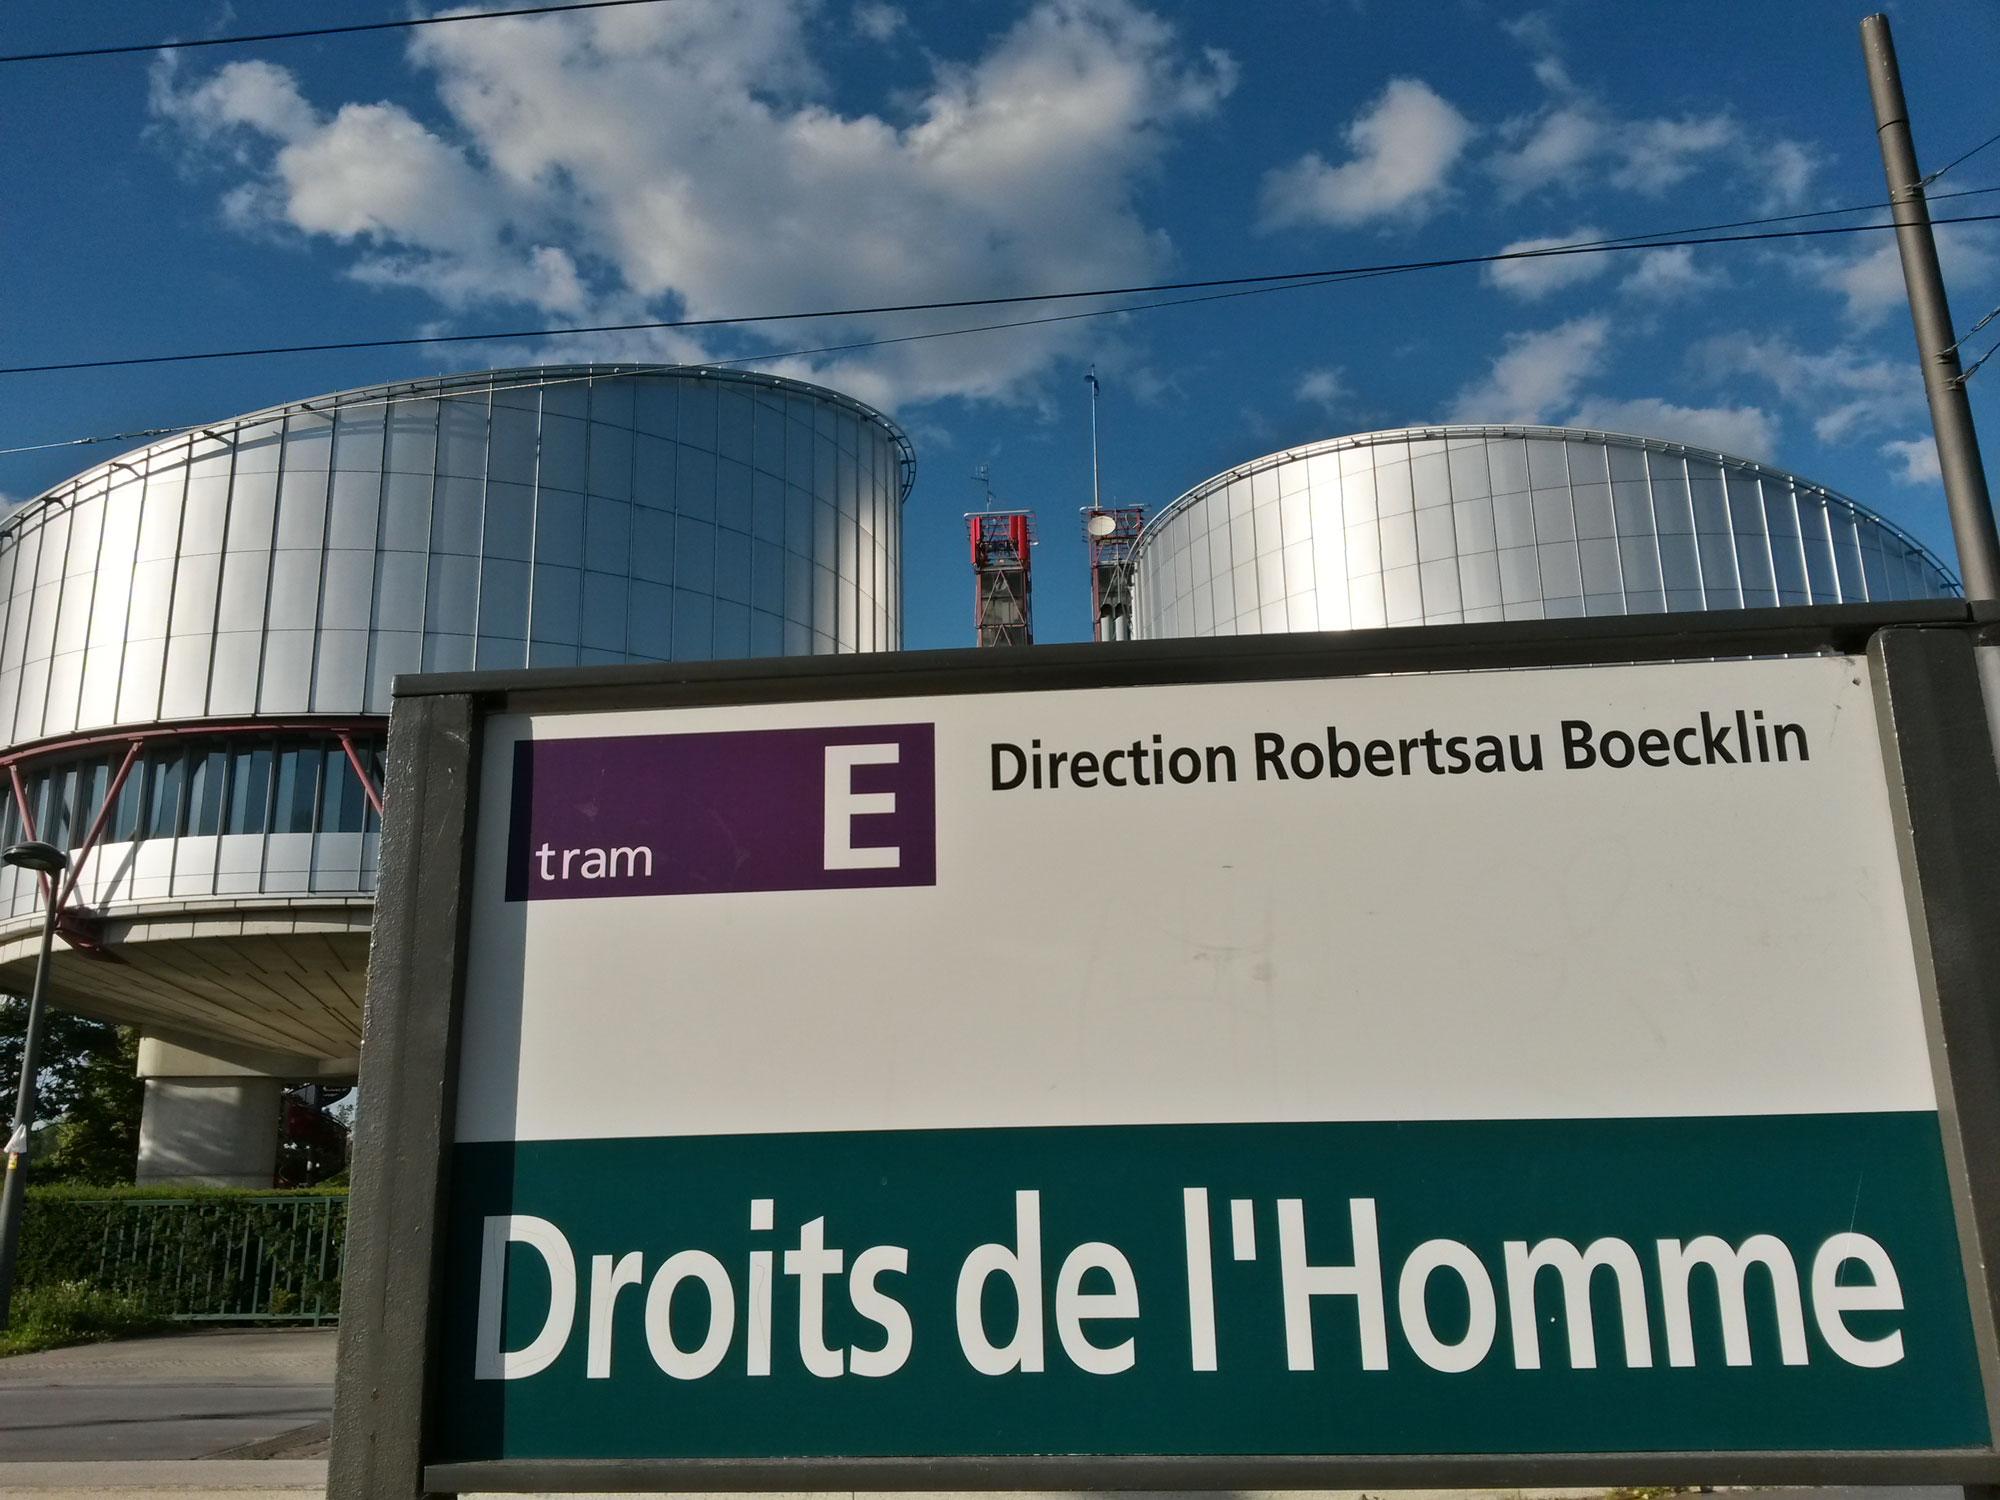 La justice europ enne condamne la suisse apr s l 39 expulsion d 39 un tamou - Trouver un logement apres expulsion ...